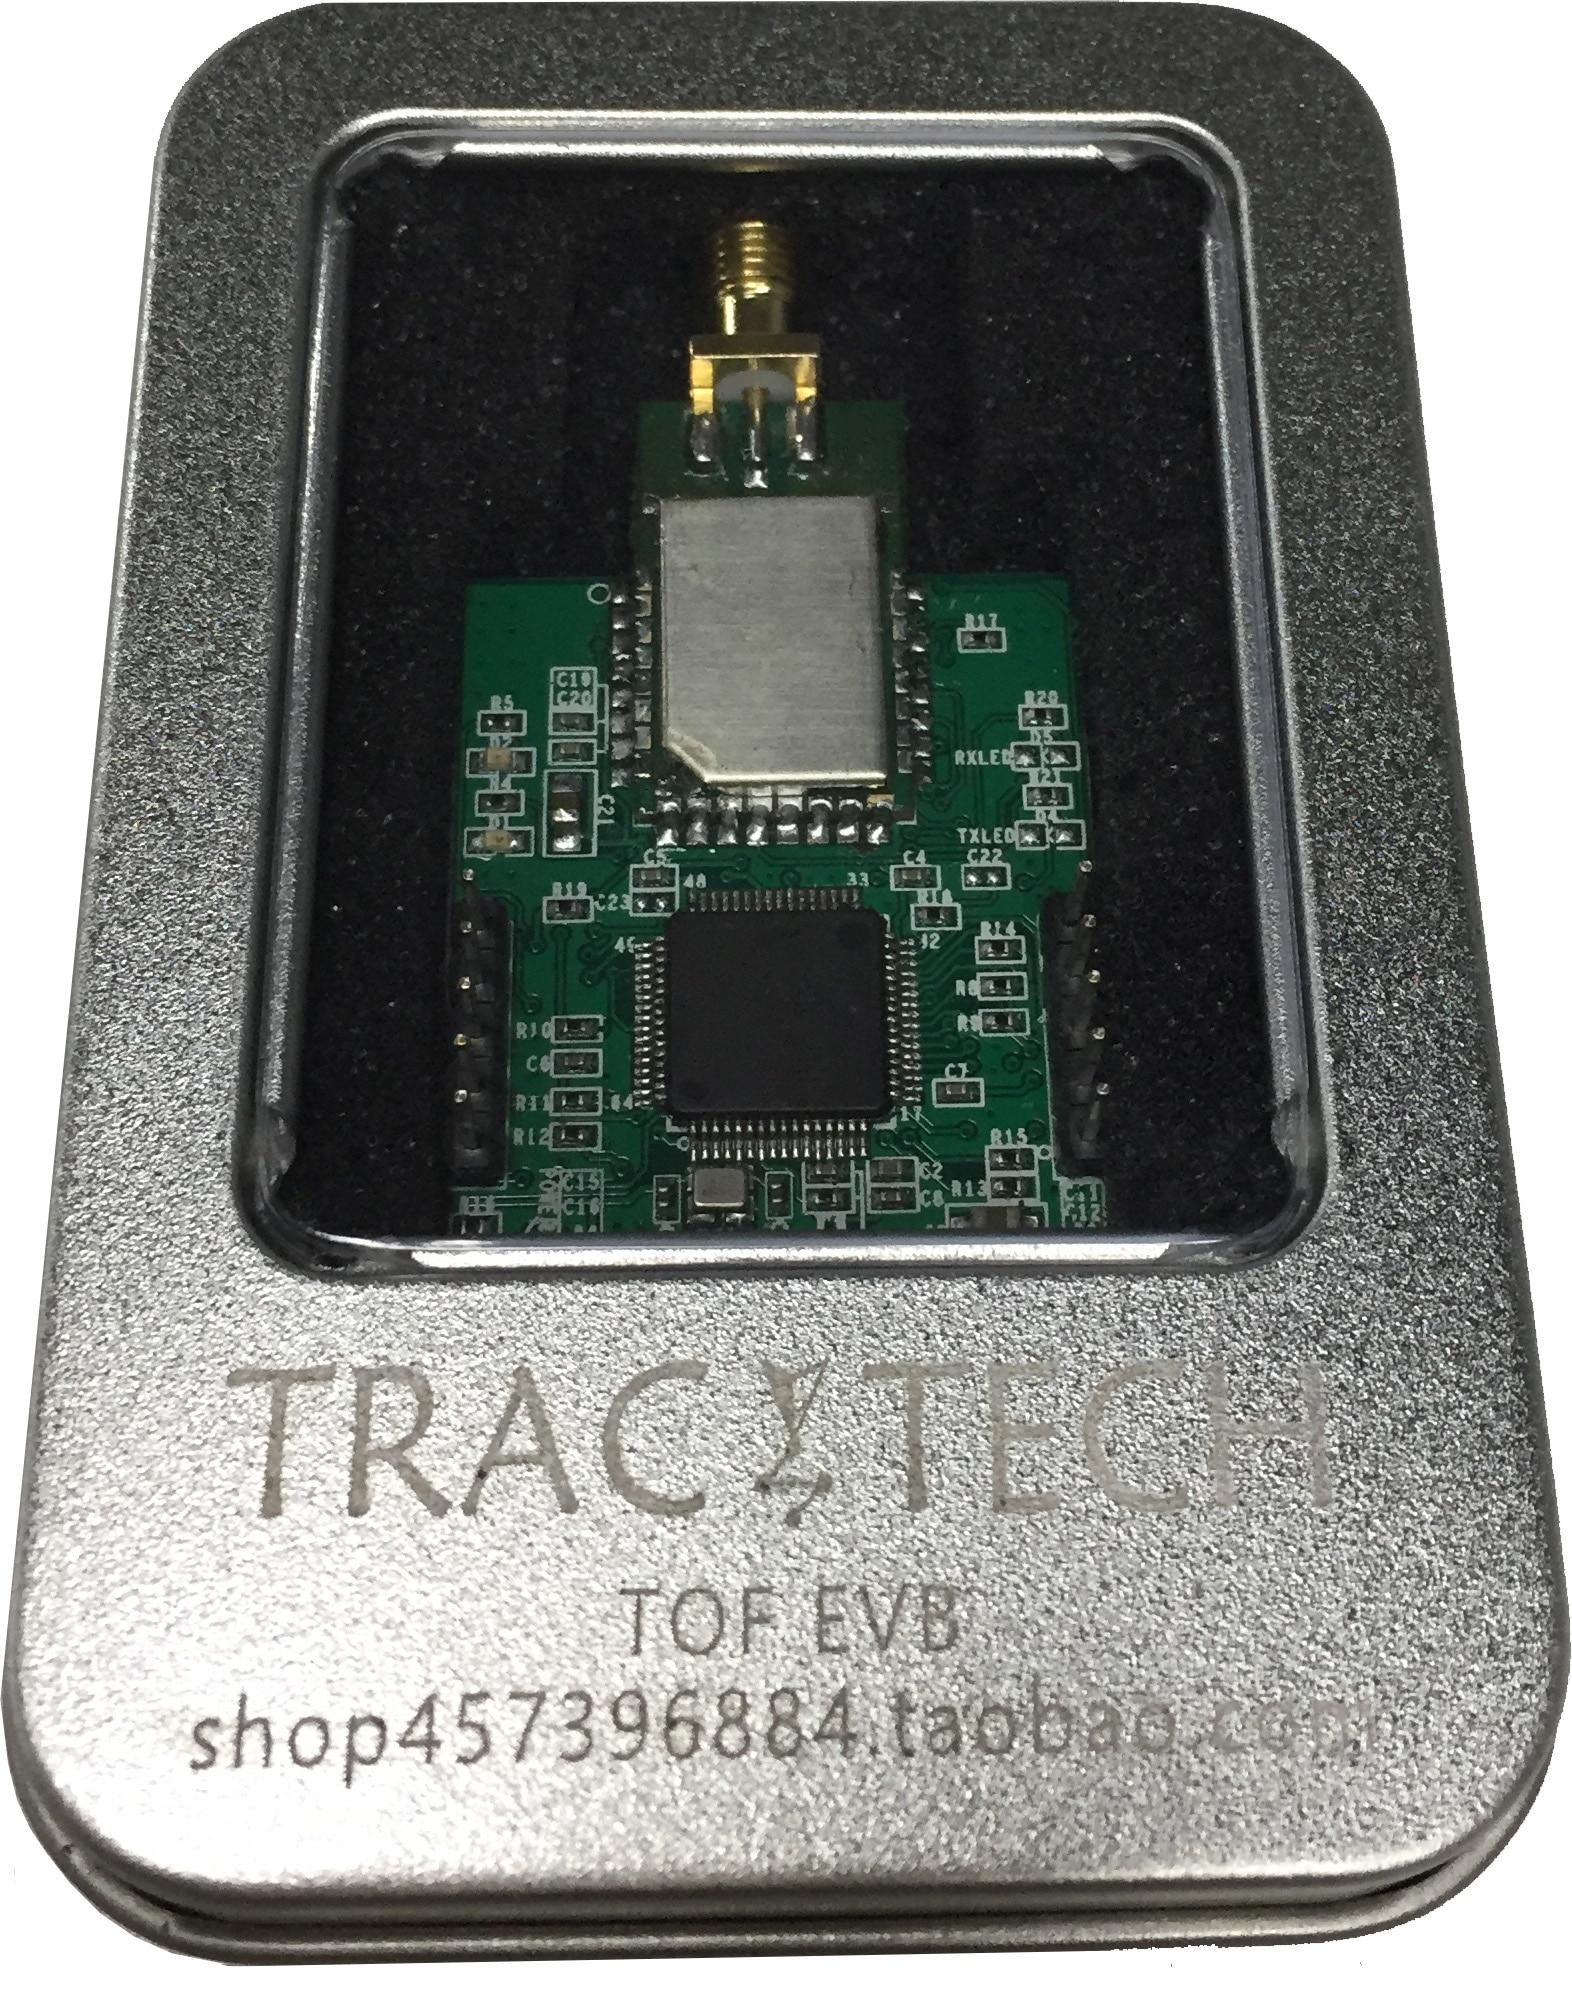 DWSMA Development Board UWB Indoor Positioning Evaluation Board Remote Module TREK1000 Upgrade Version